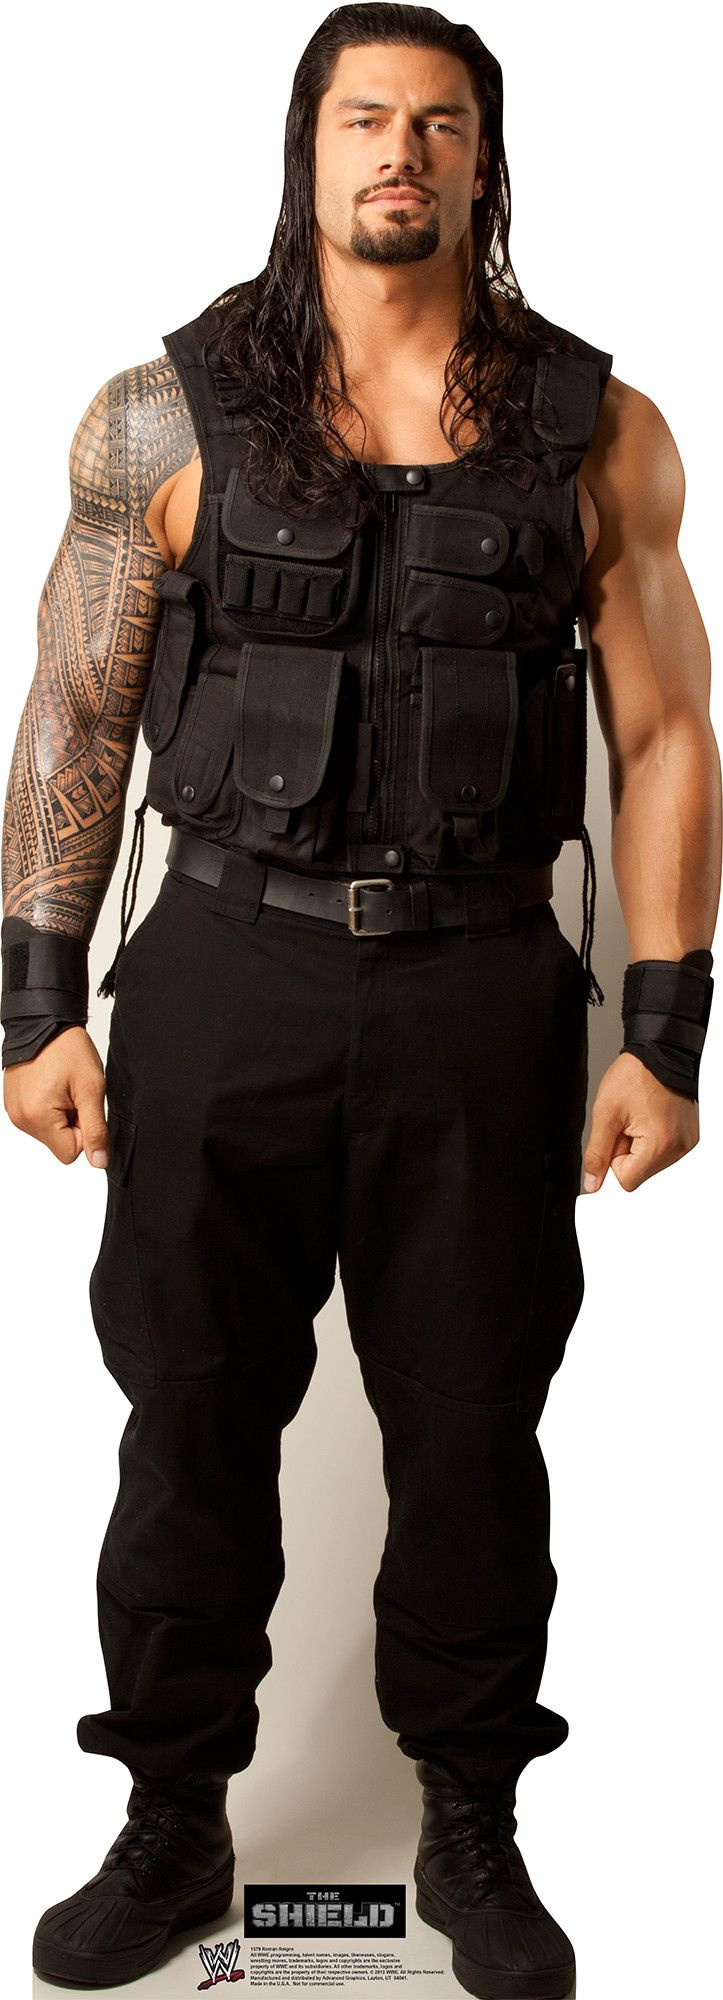 Roman Reigns - WWE Cardboard Standup